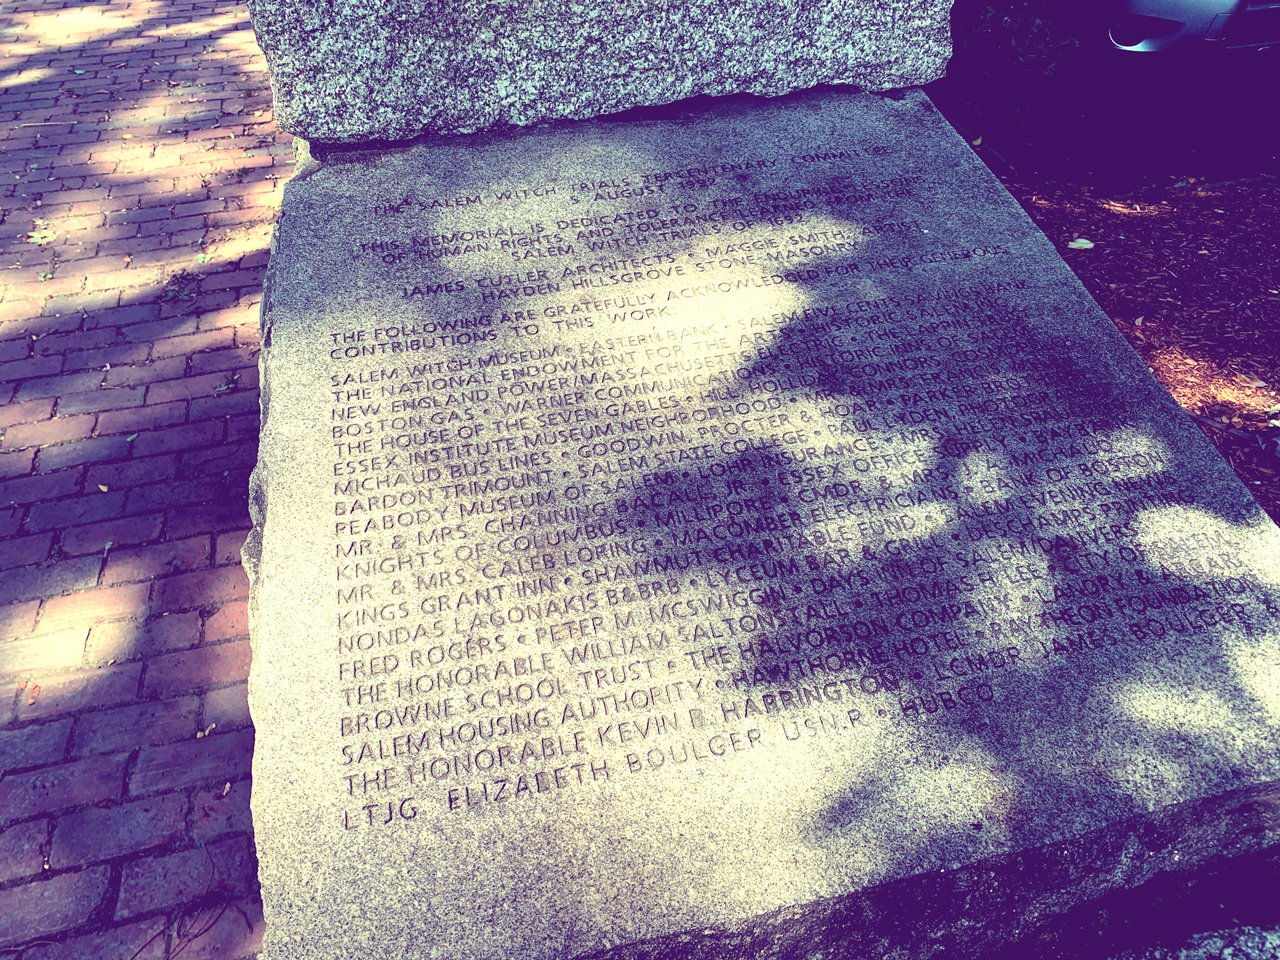 salem-witch-trials-memorial-massachusetts-1280x960-03